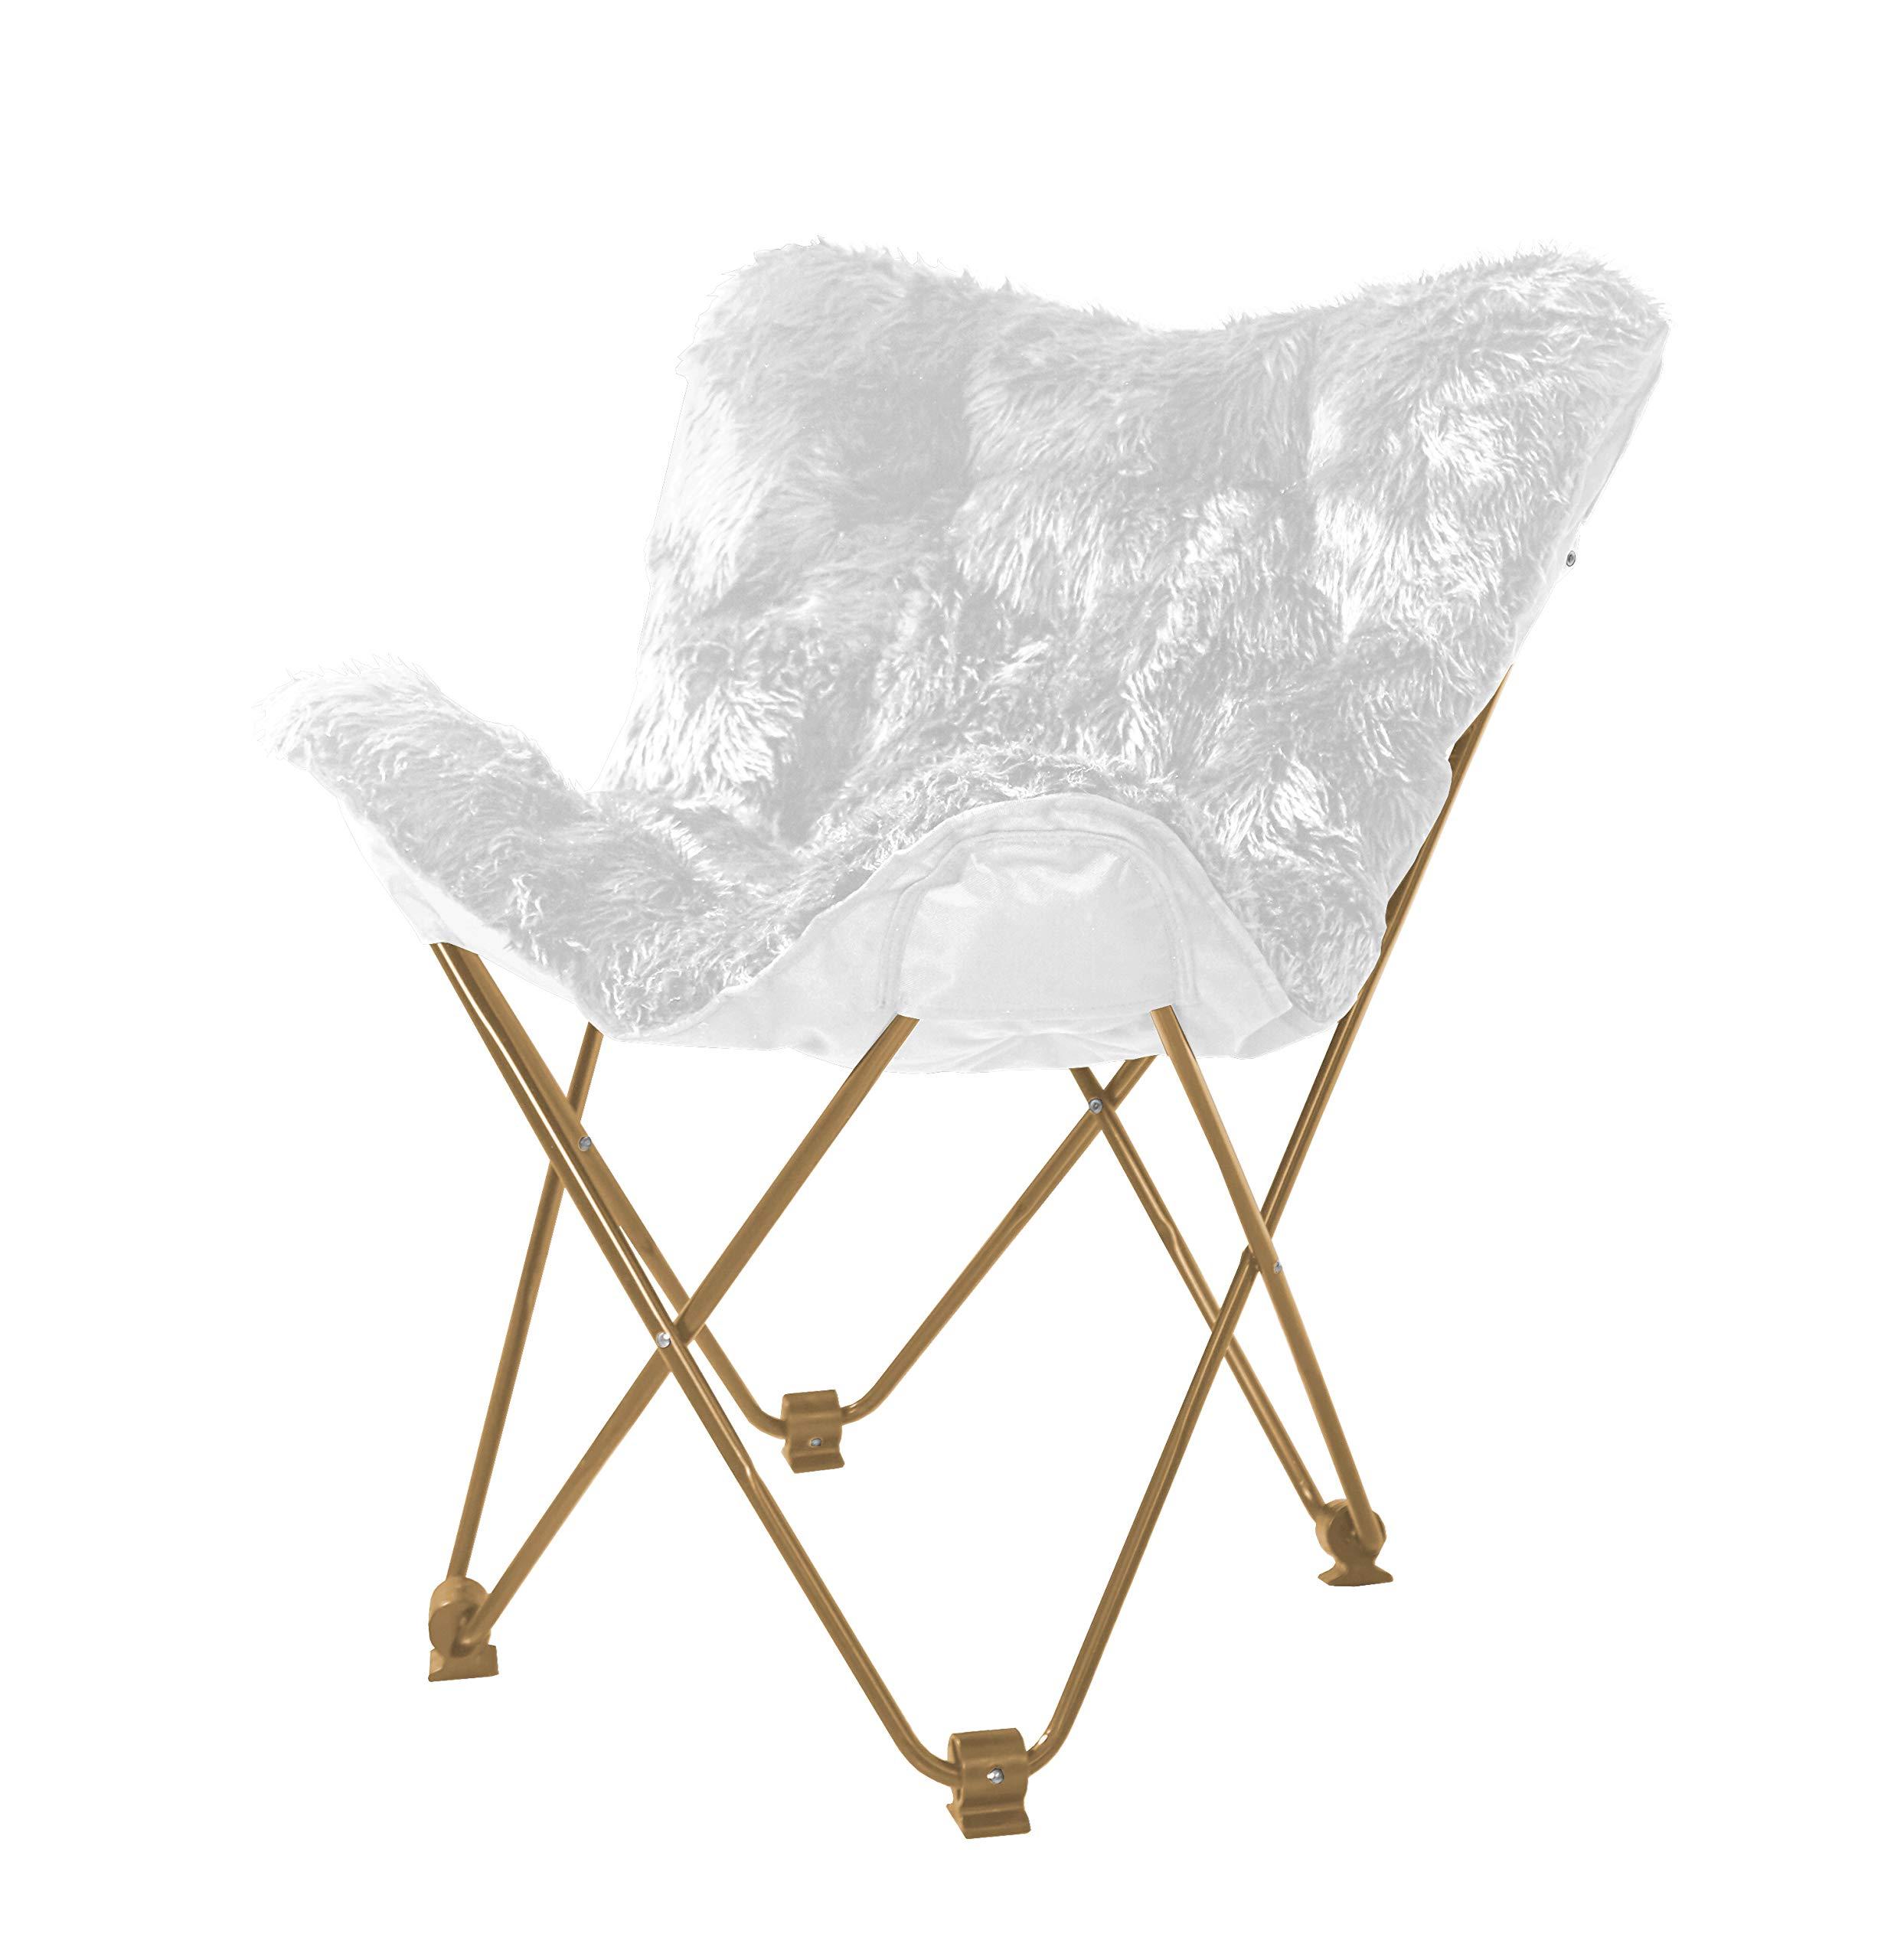 Urban Shop WK657560 Mongolian Butterfly Chair, White